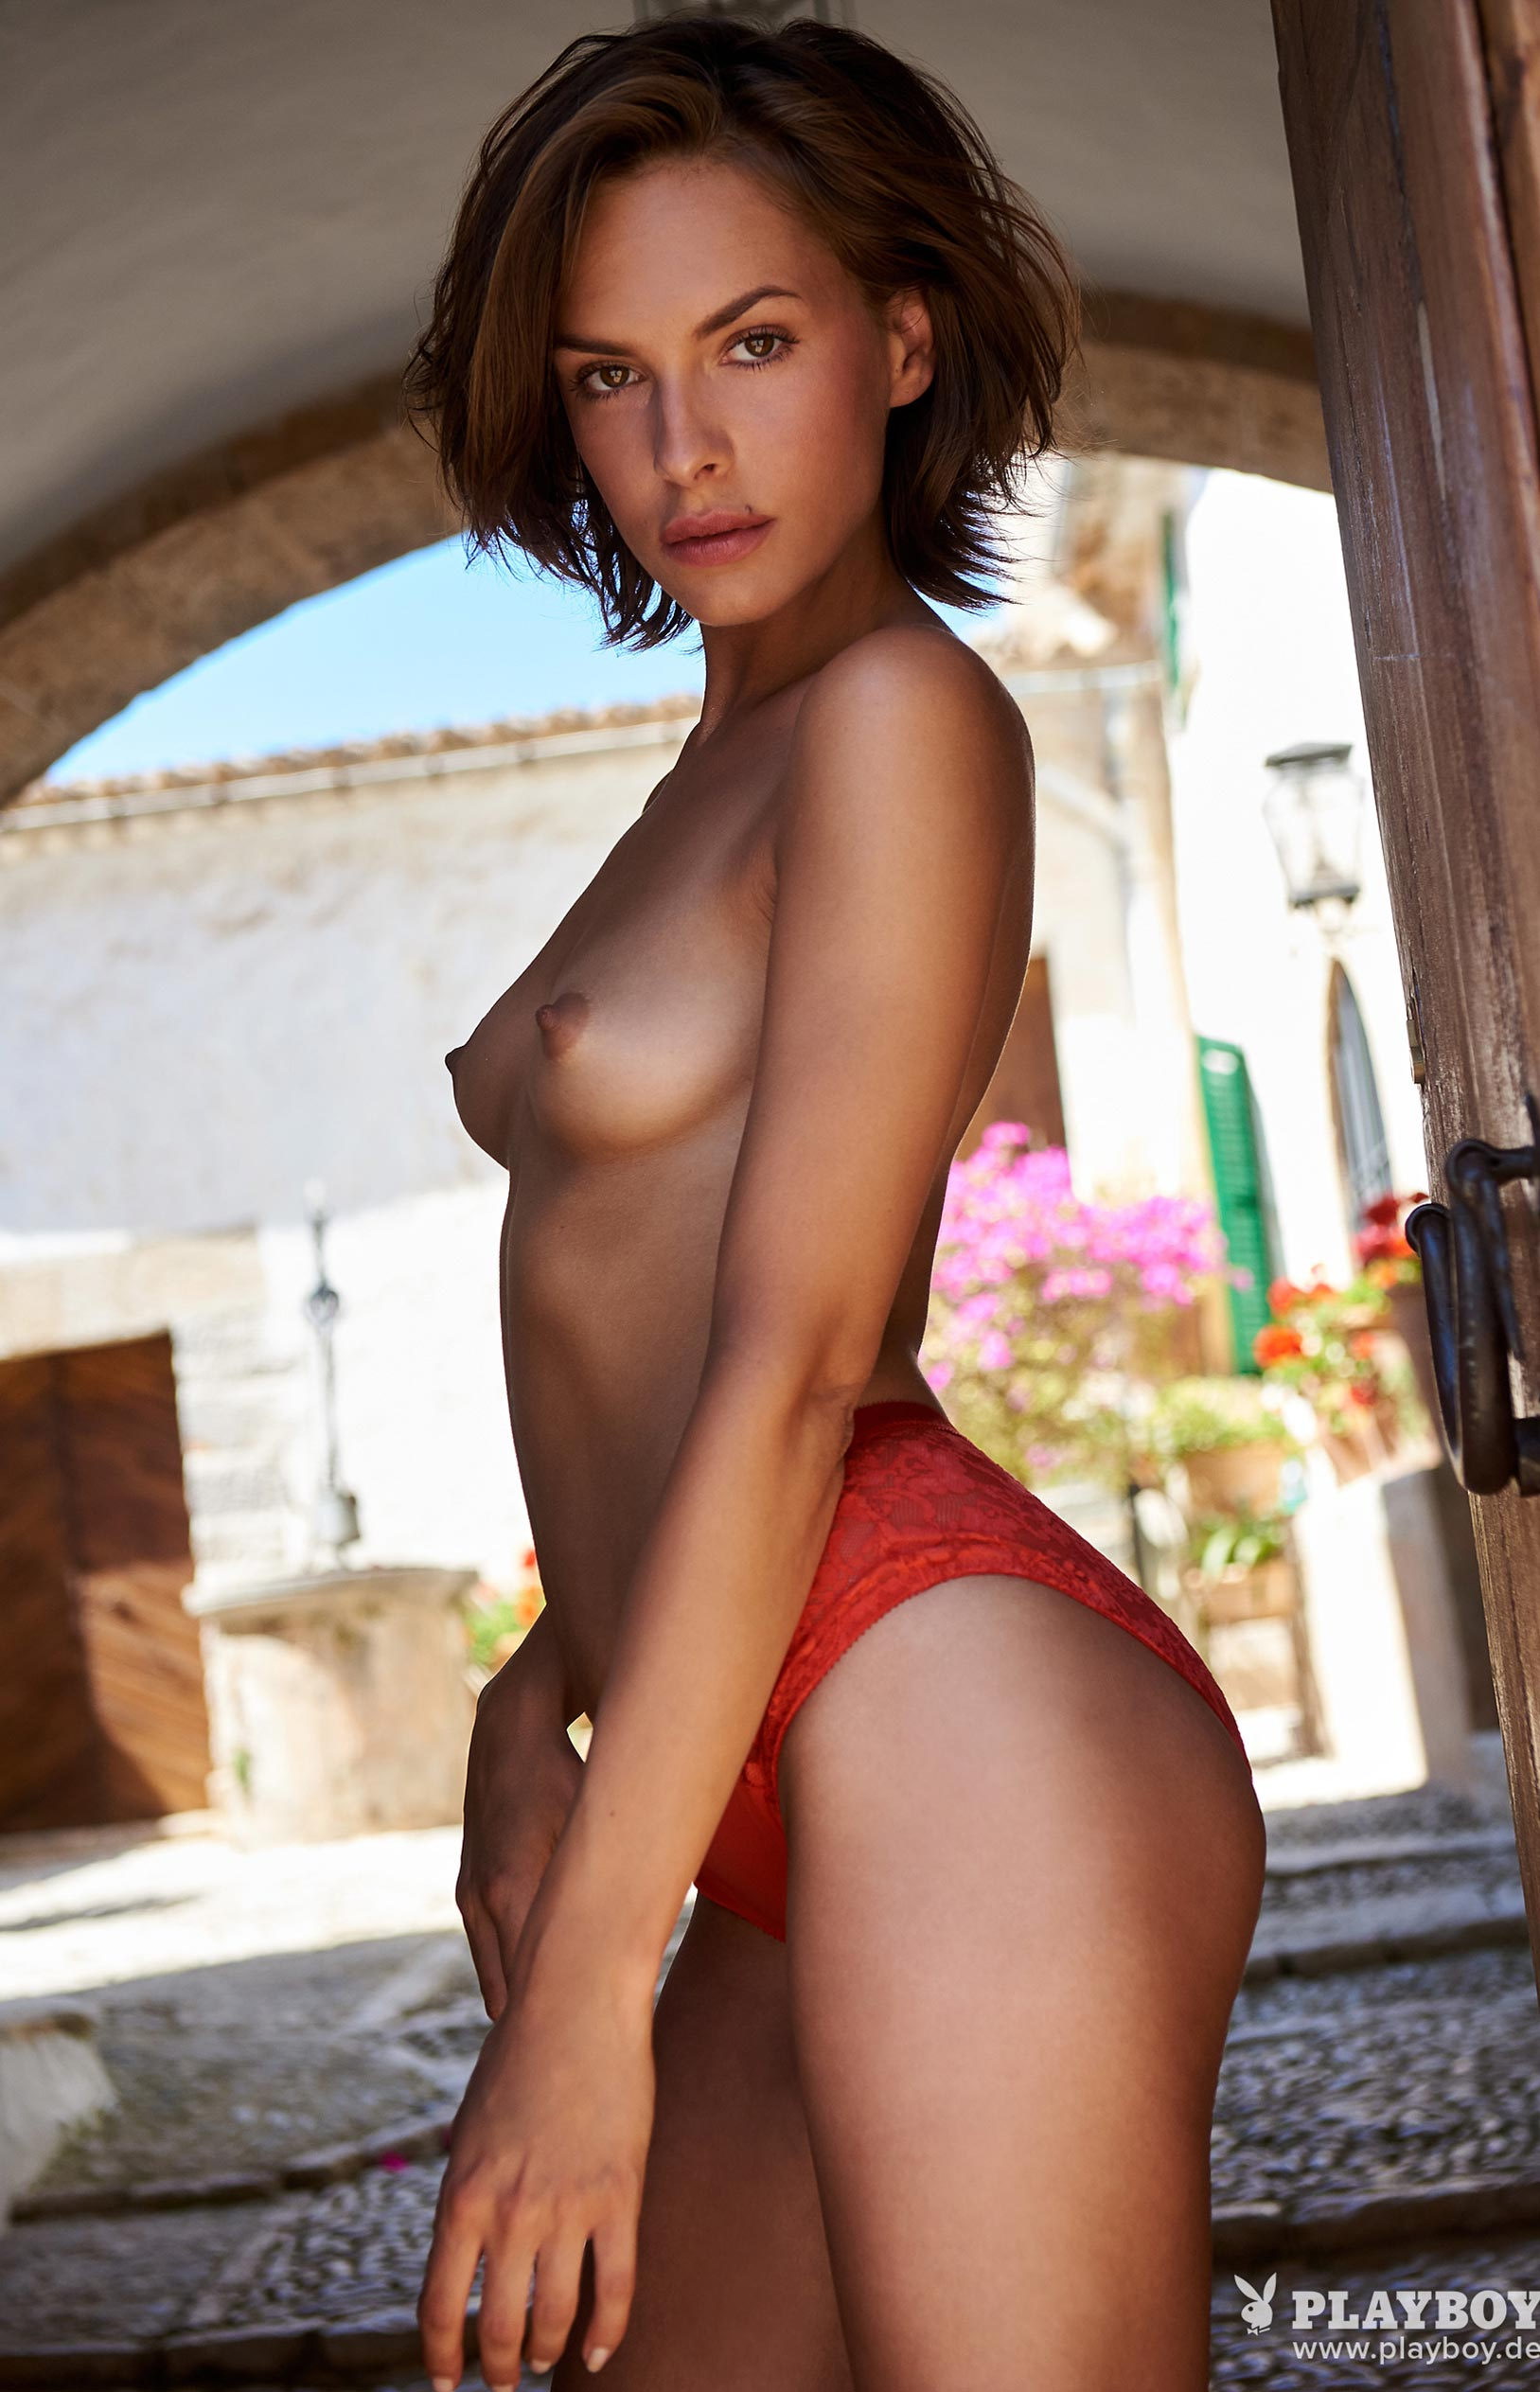 Оливия Пельцер - Девушка месяца Playboy Германия, сентябрь 2018 / фото 04